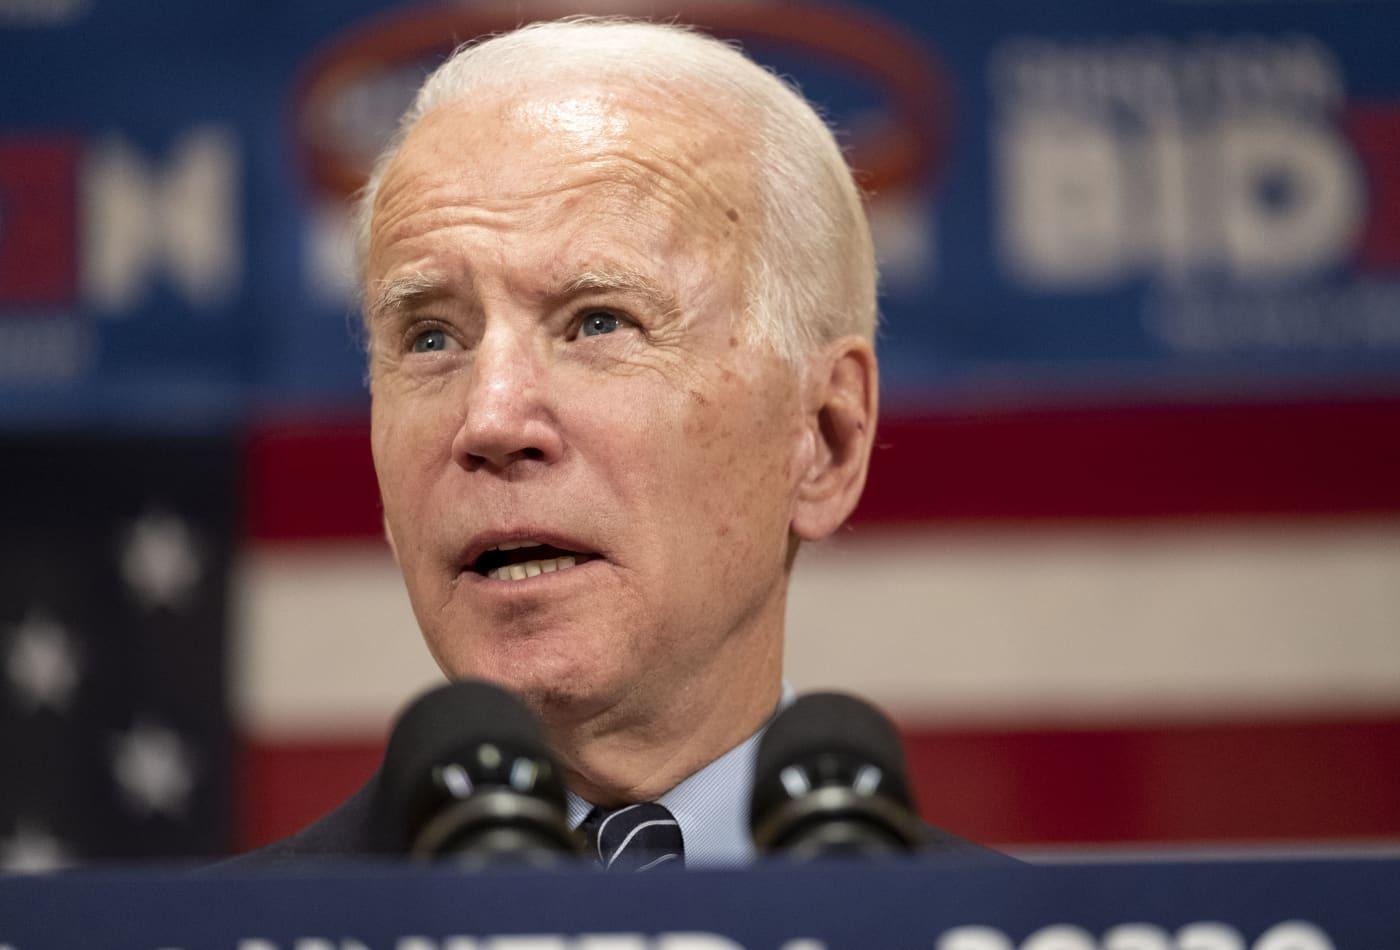 Biden leads Sanders in Ohio and Arizona as he looks to extend his primary edge: NBC/Marist polls